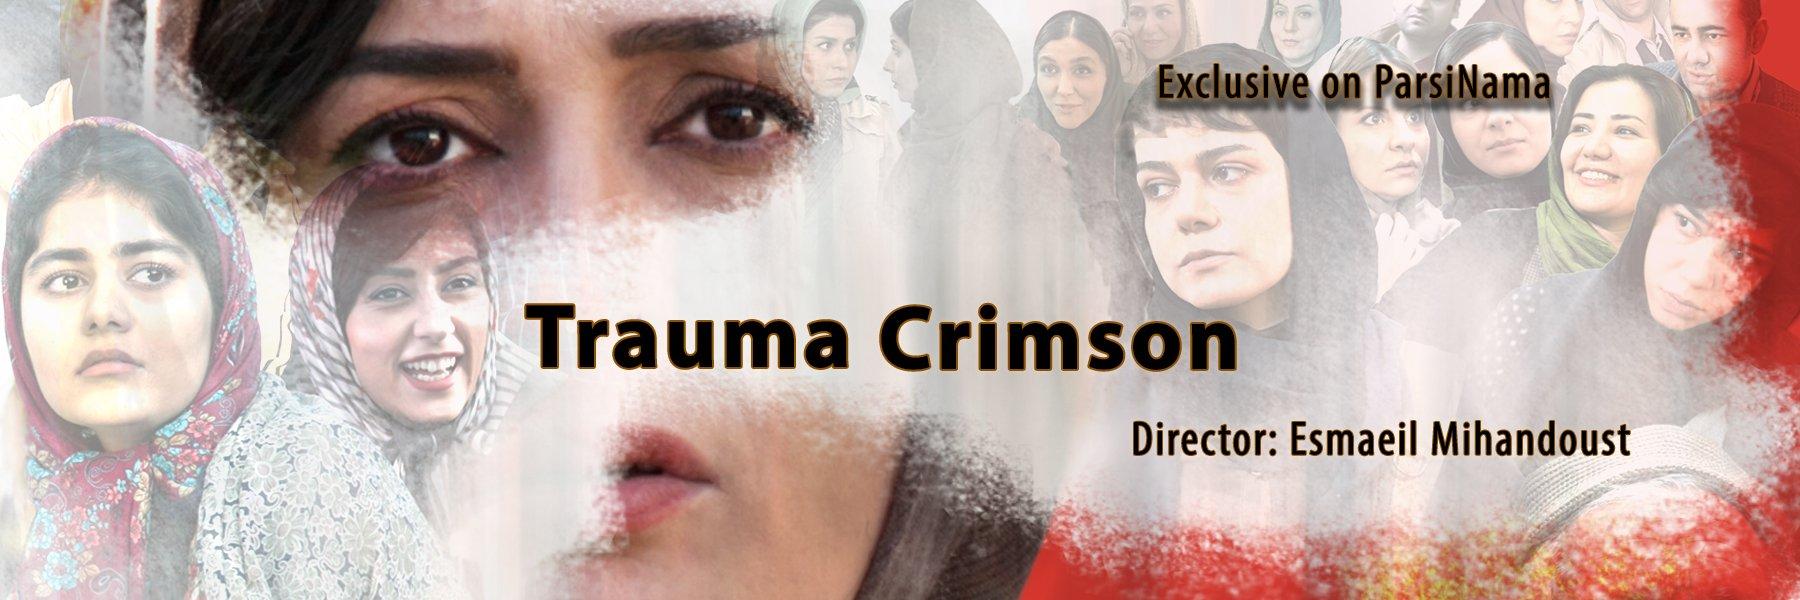 Trauma Crimson (Tromay-e Sorkh)